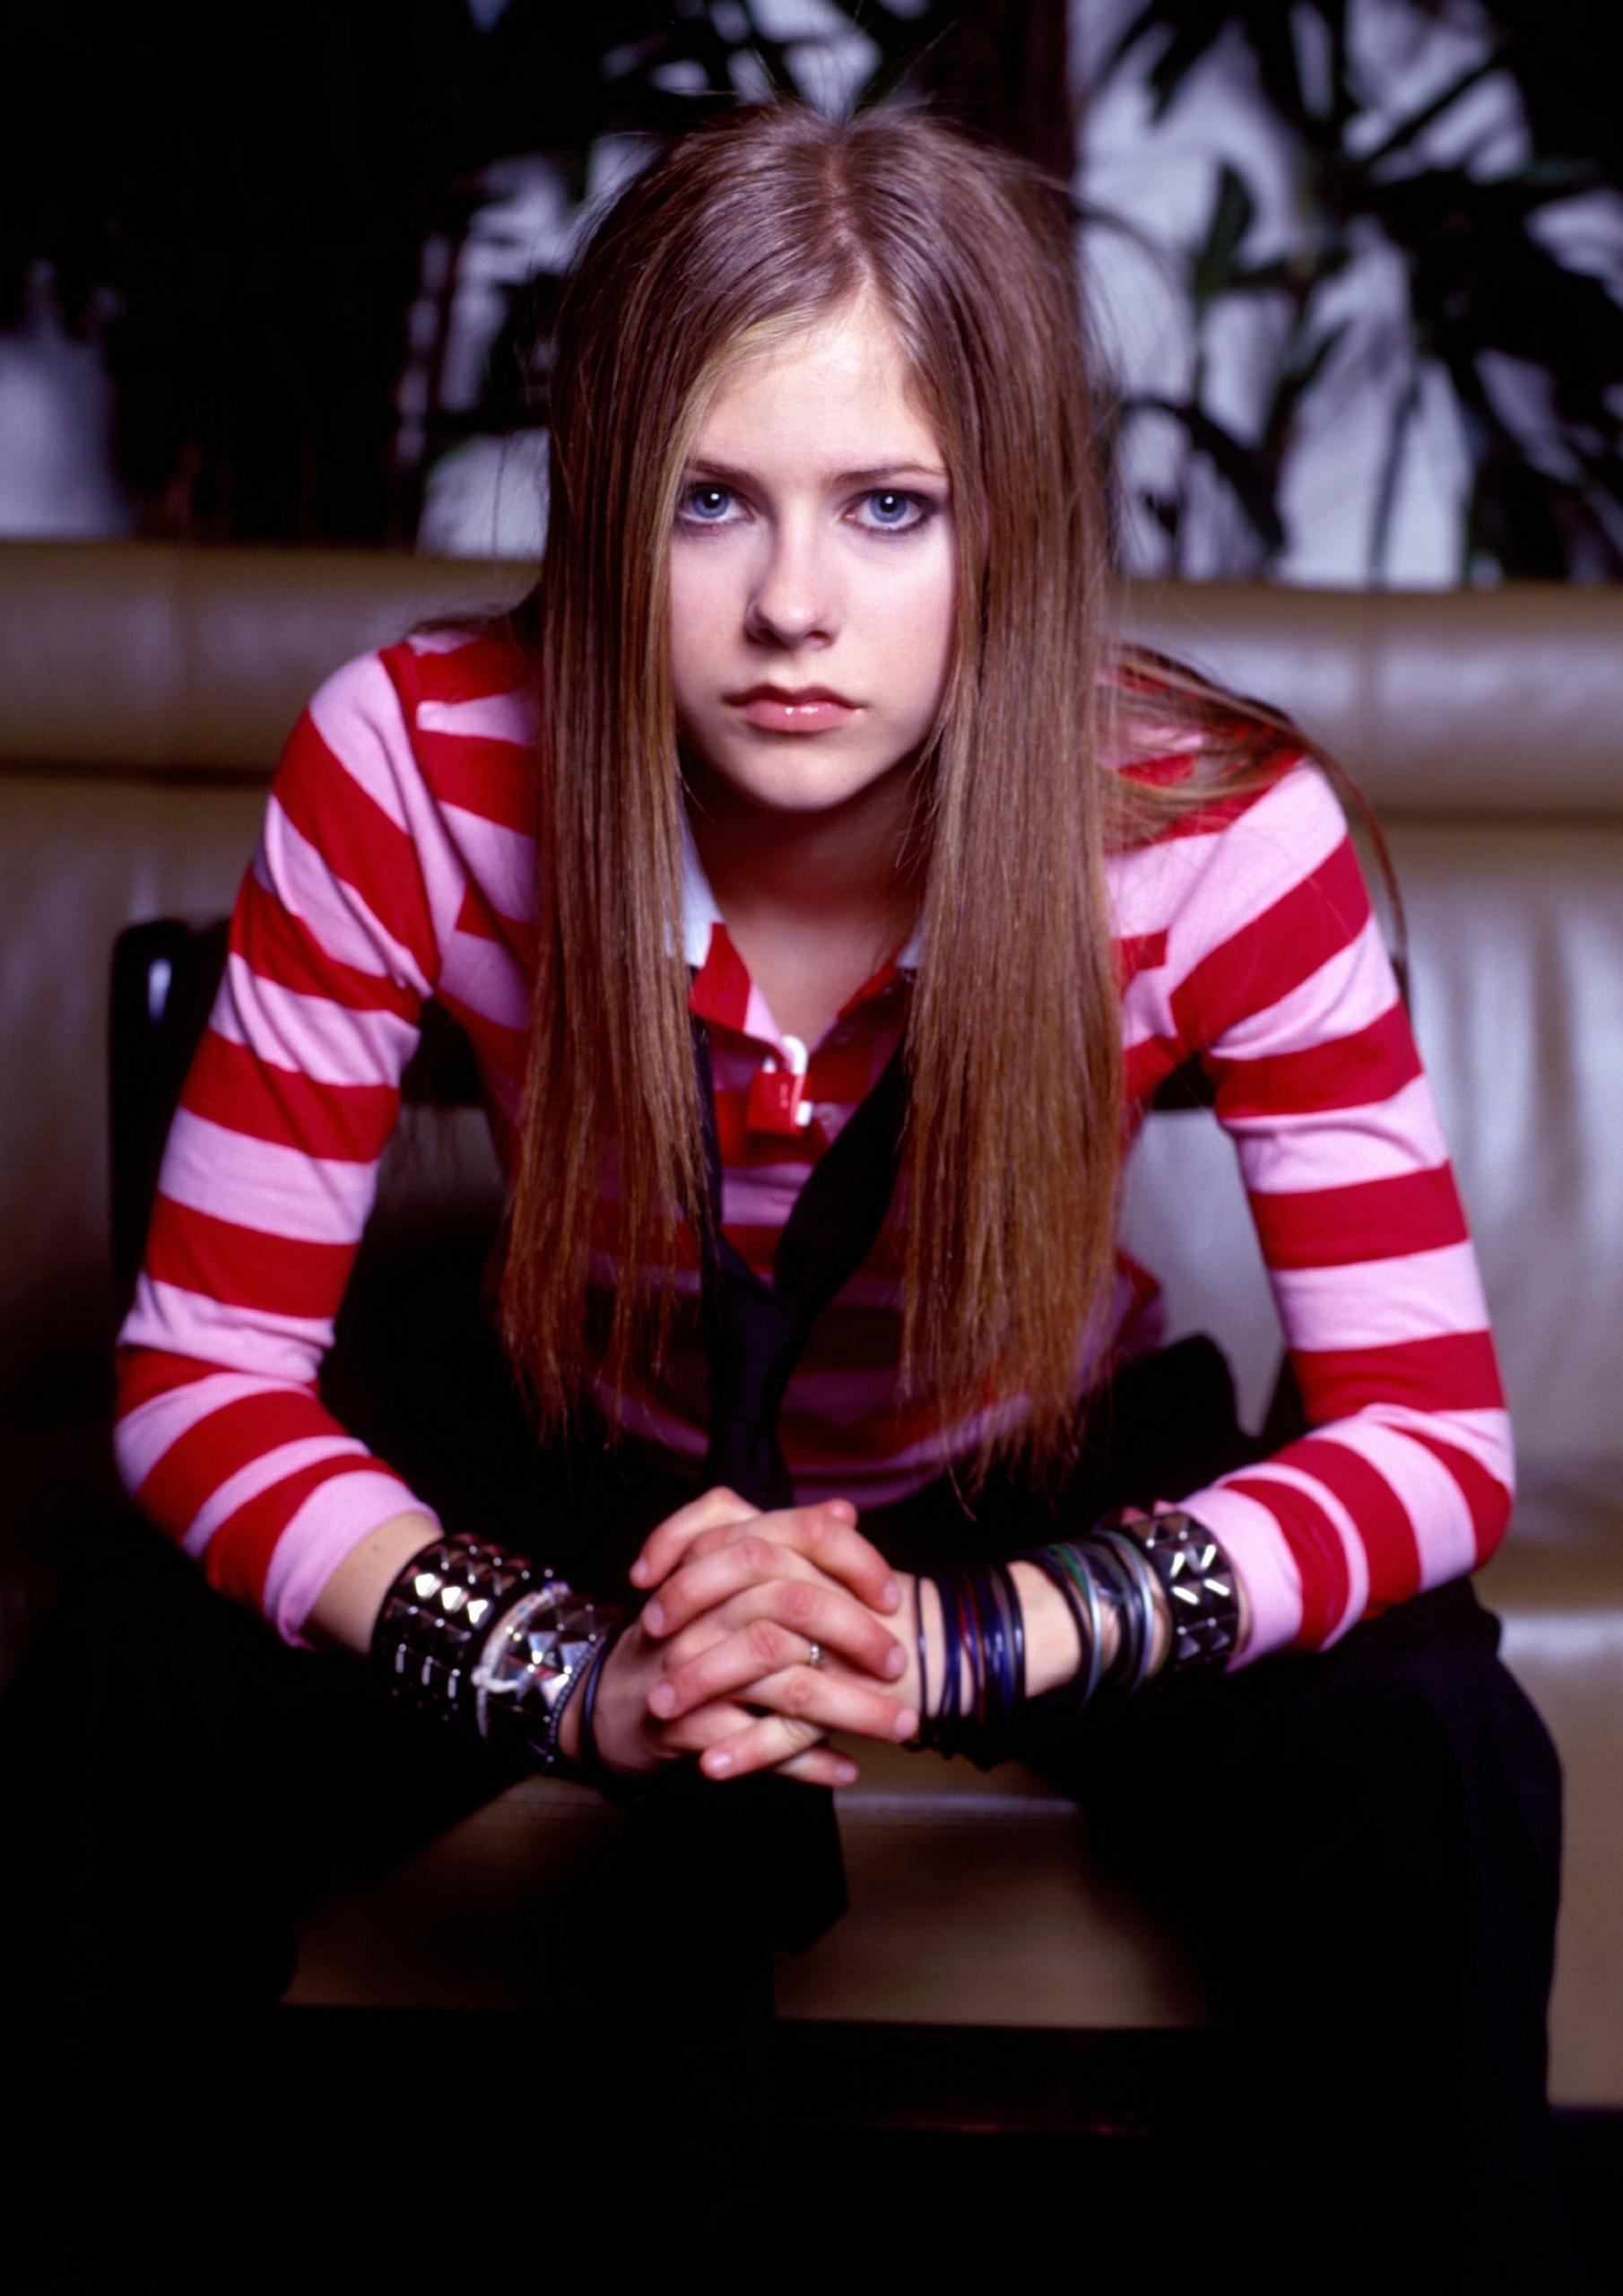 Staircase Photoshoot 2002 - Avril Lavigne Photo (32417981